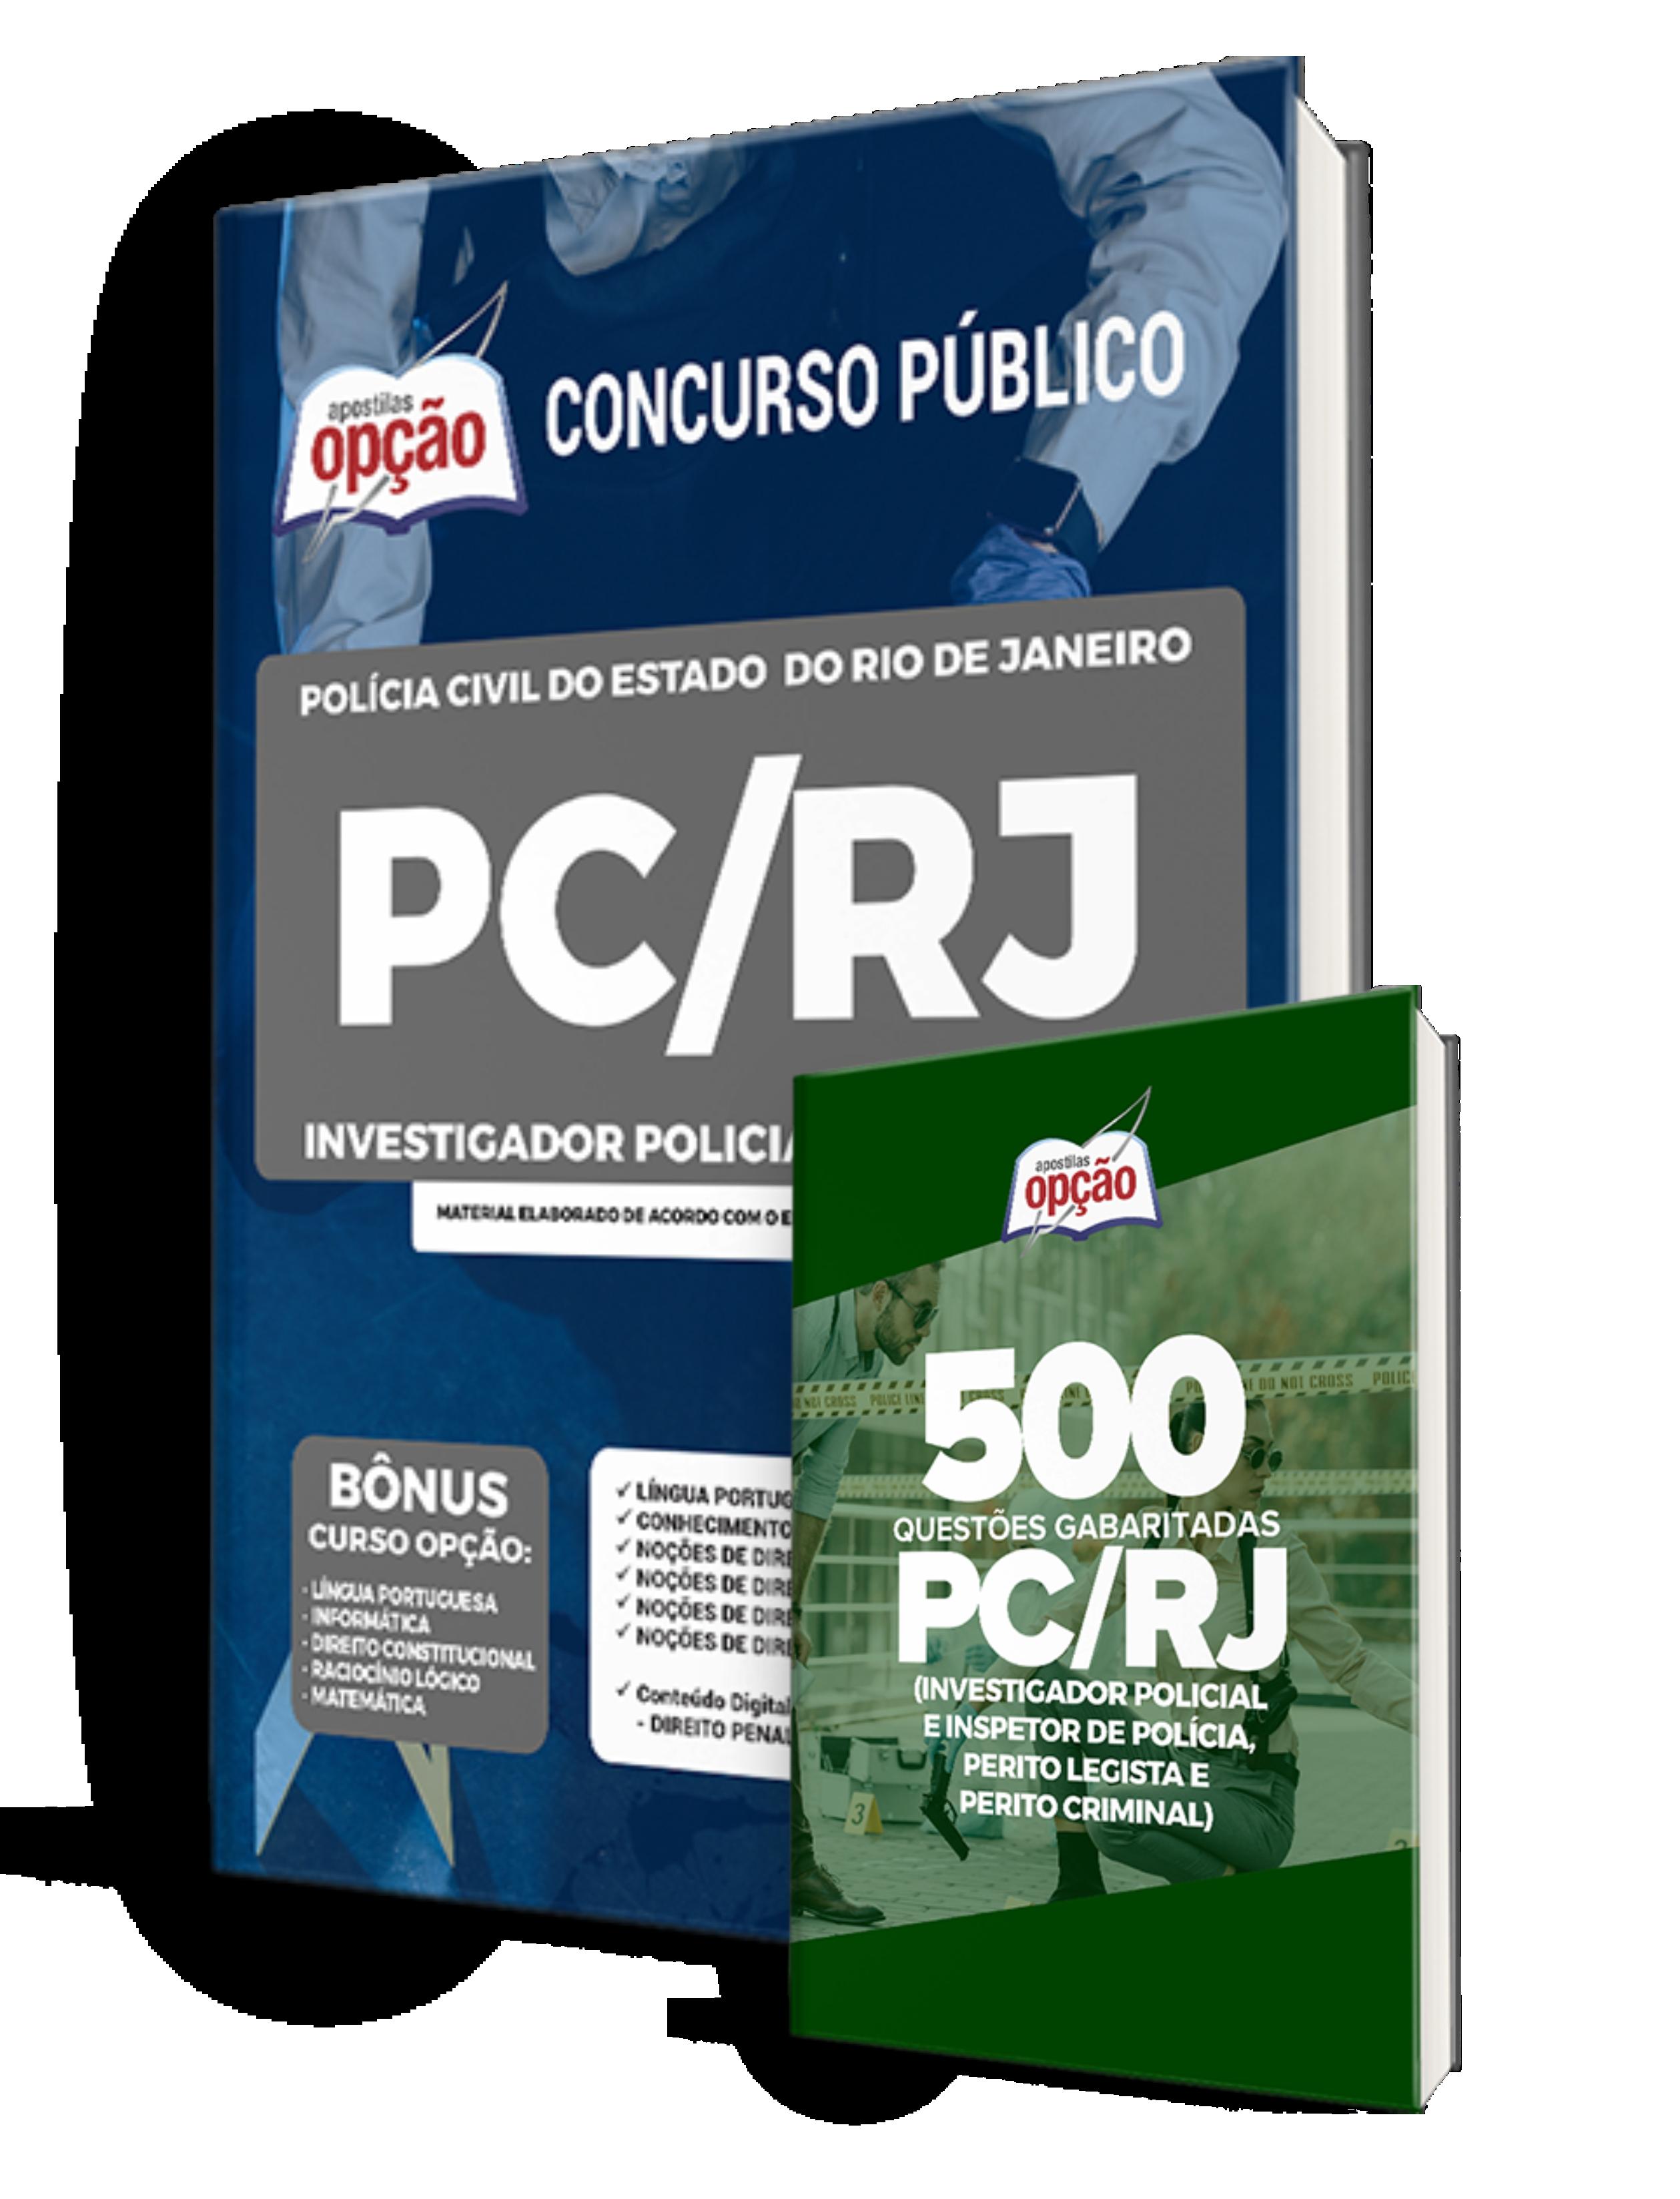 Combo PC-RJ - Investigador Policial 3ª Classe